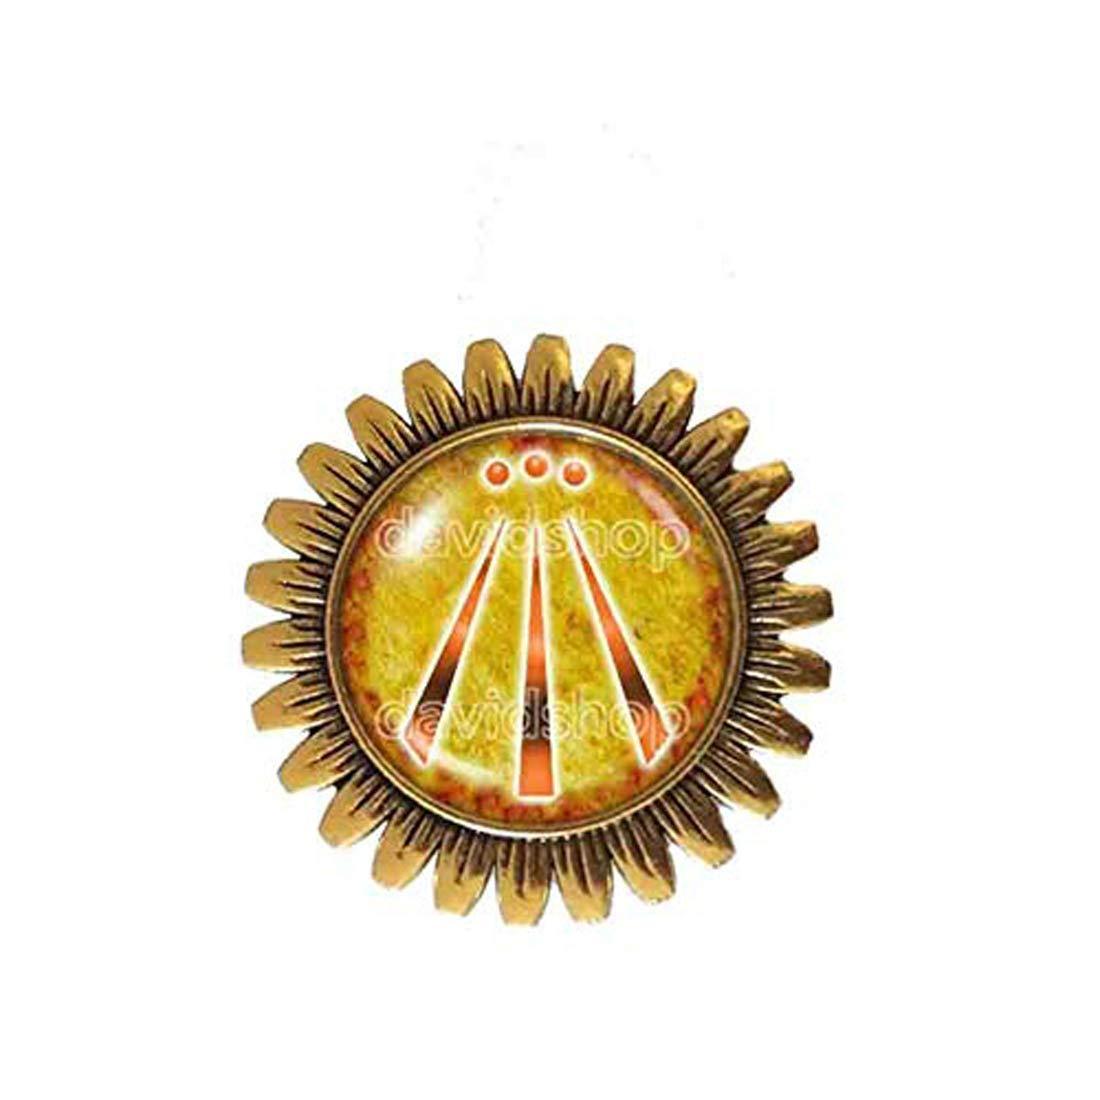 Handmade Fashion Jewelry Symbol Skull Druid Awen Brooch Badge Pin Cosplay